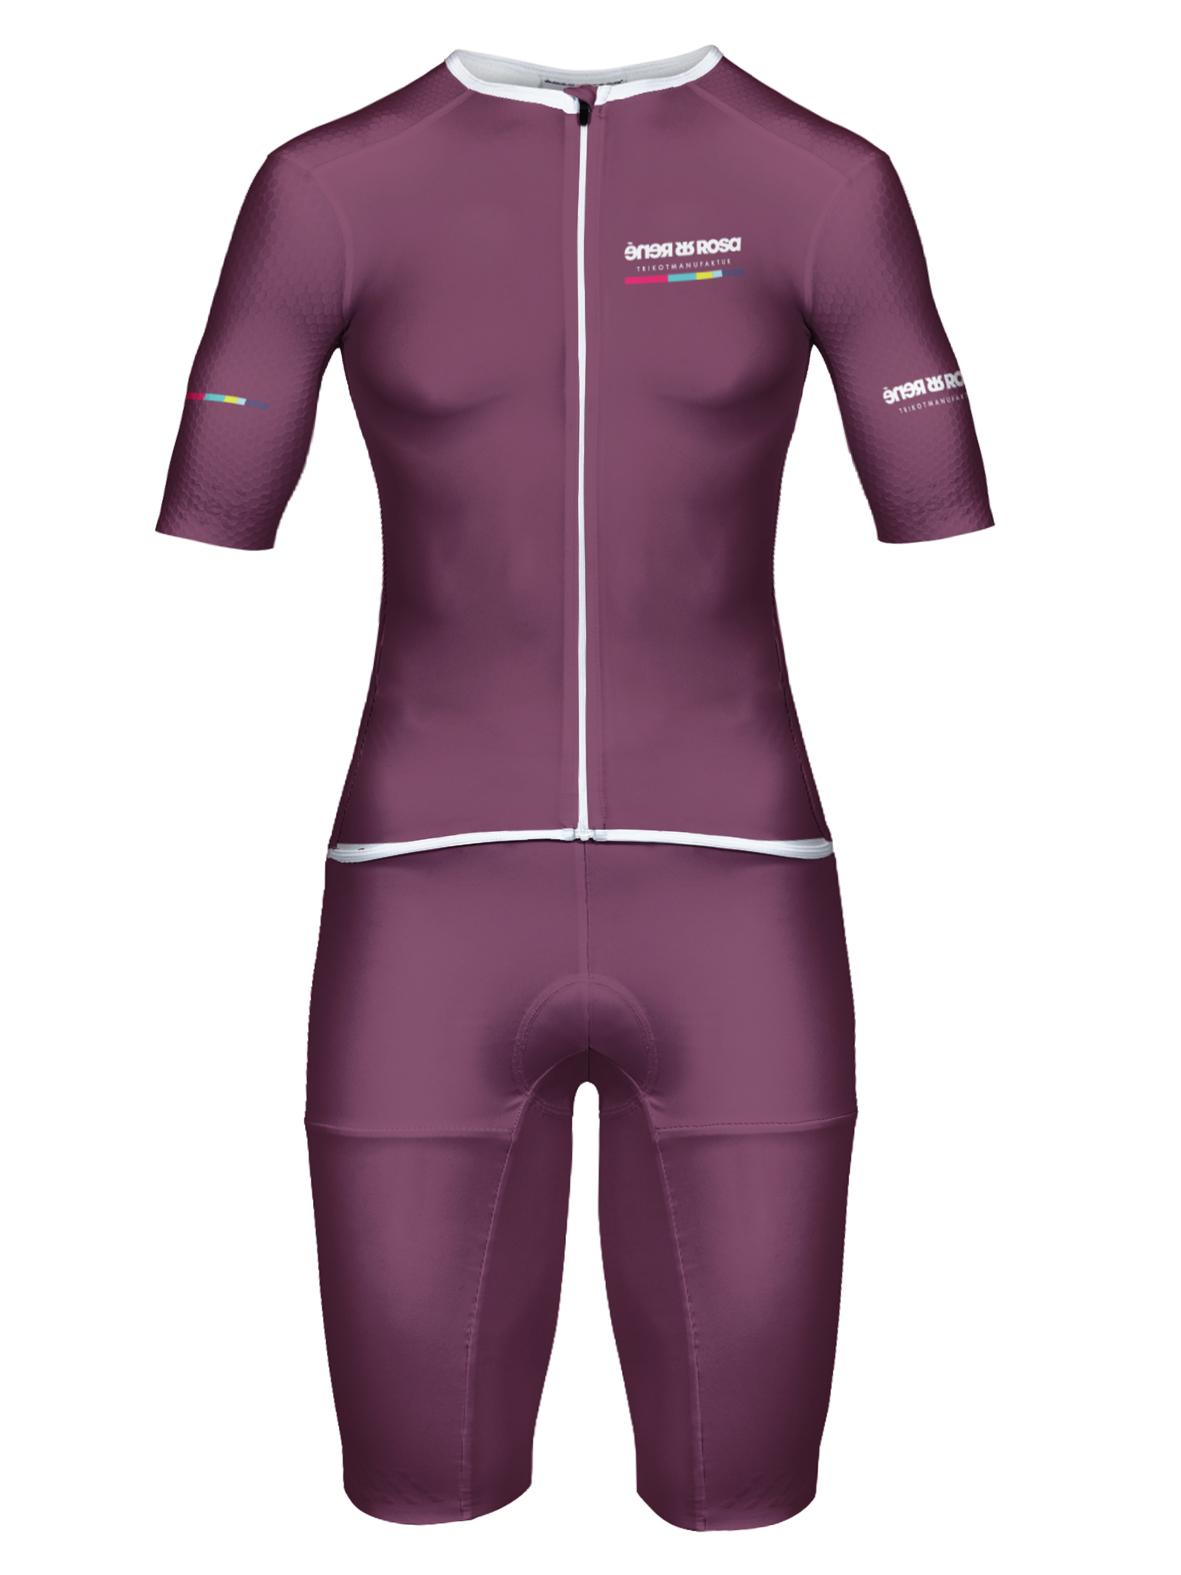 Aero Triathlon Einteiler  RRT2777W Damen / RR-Stripes Purple